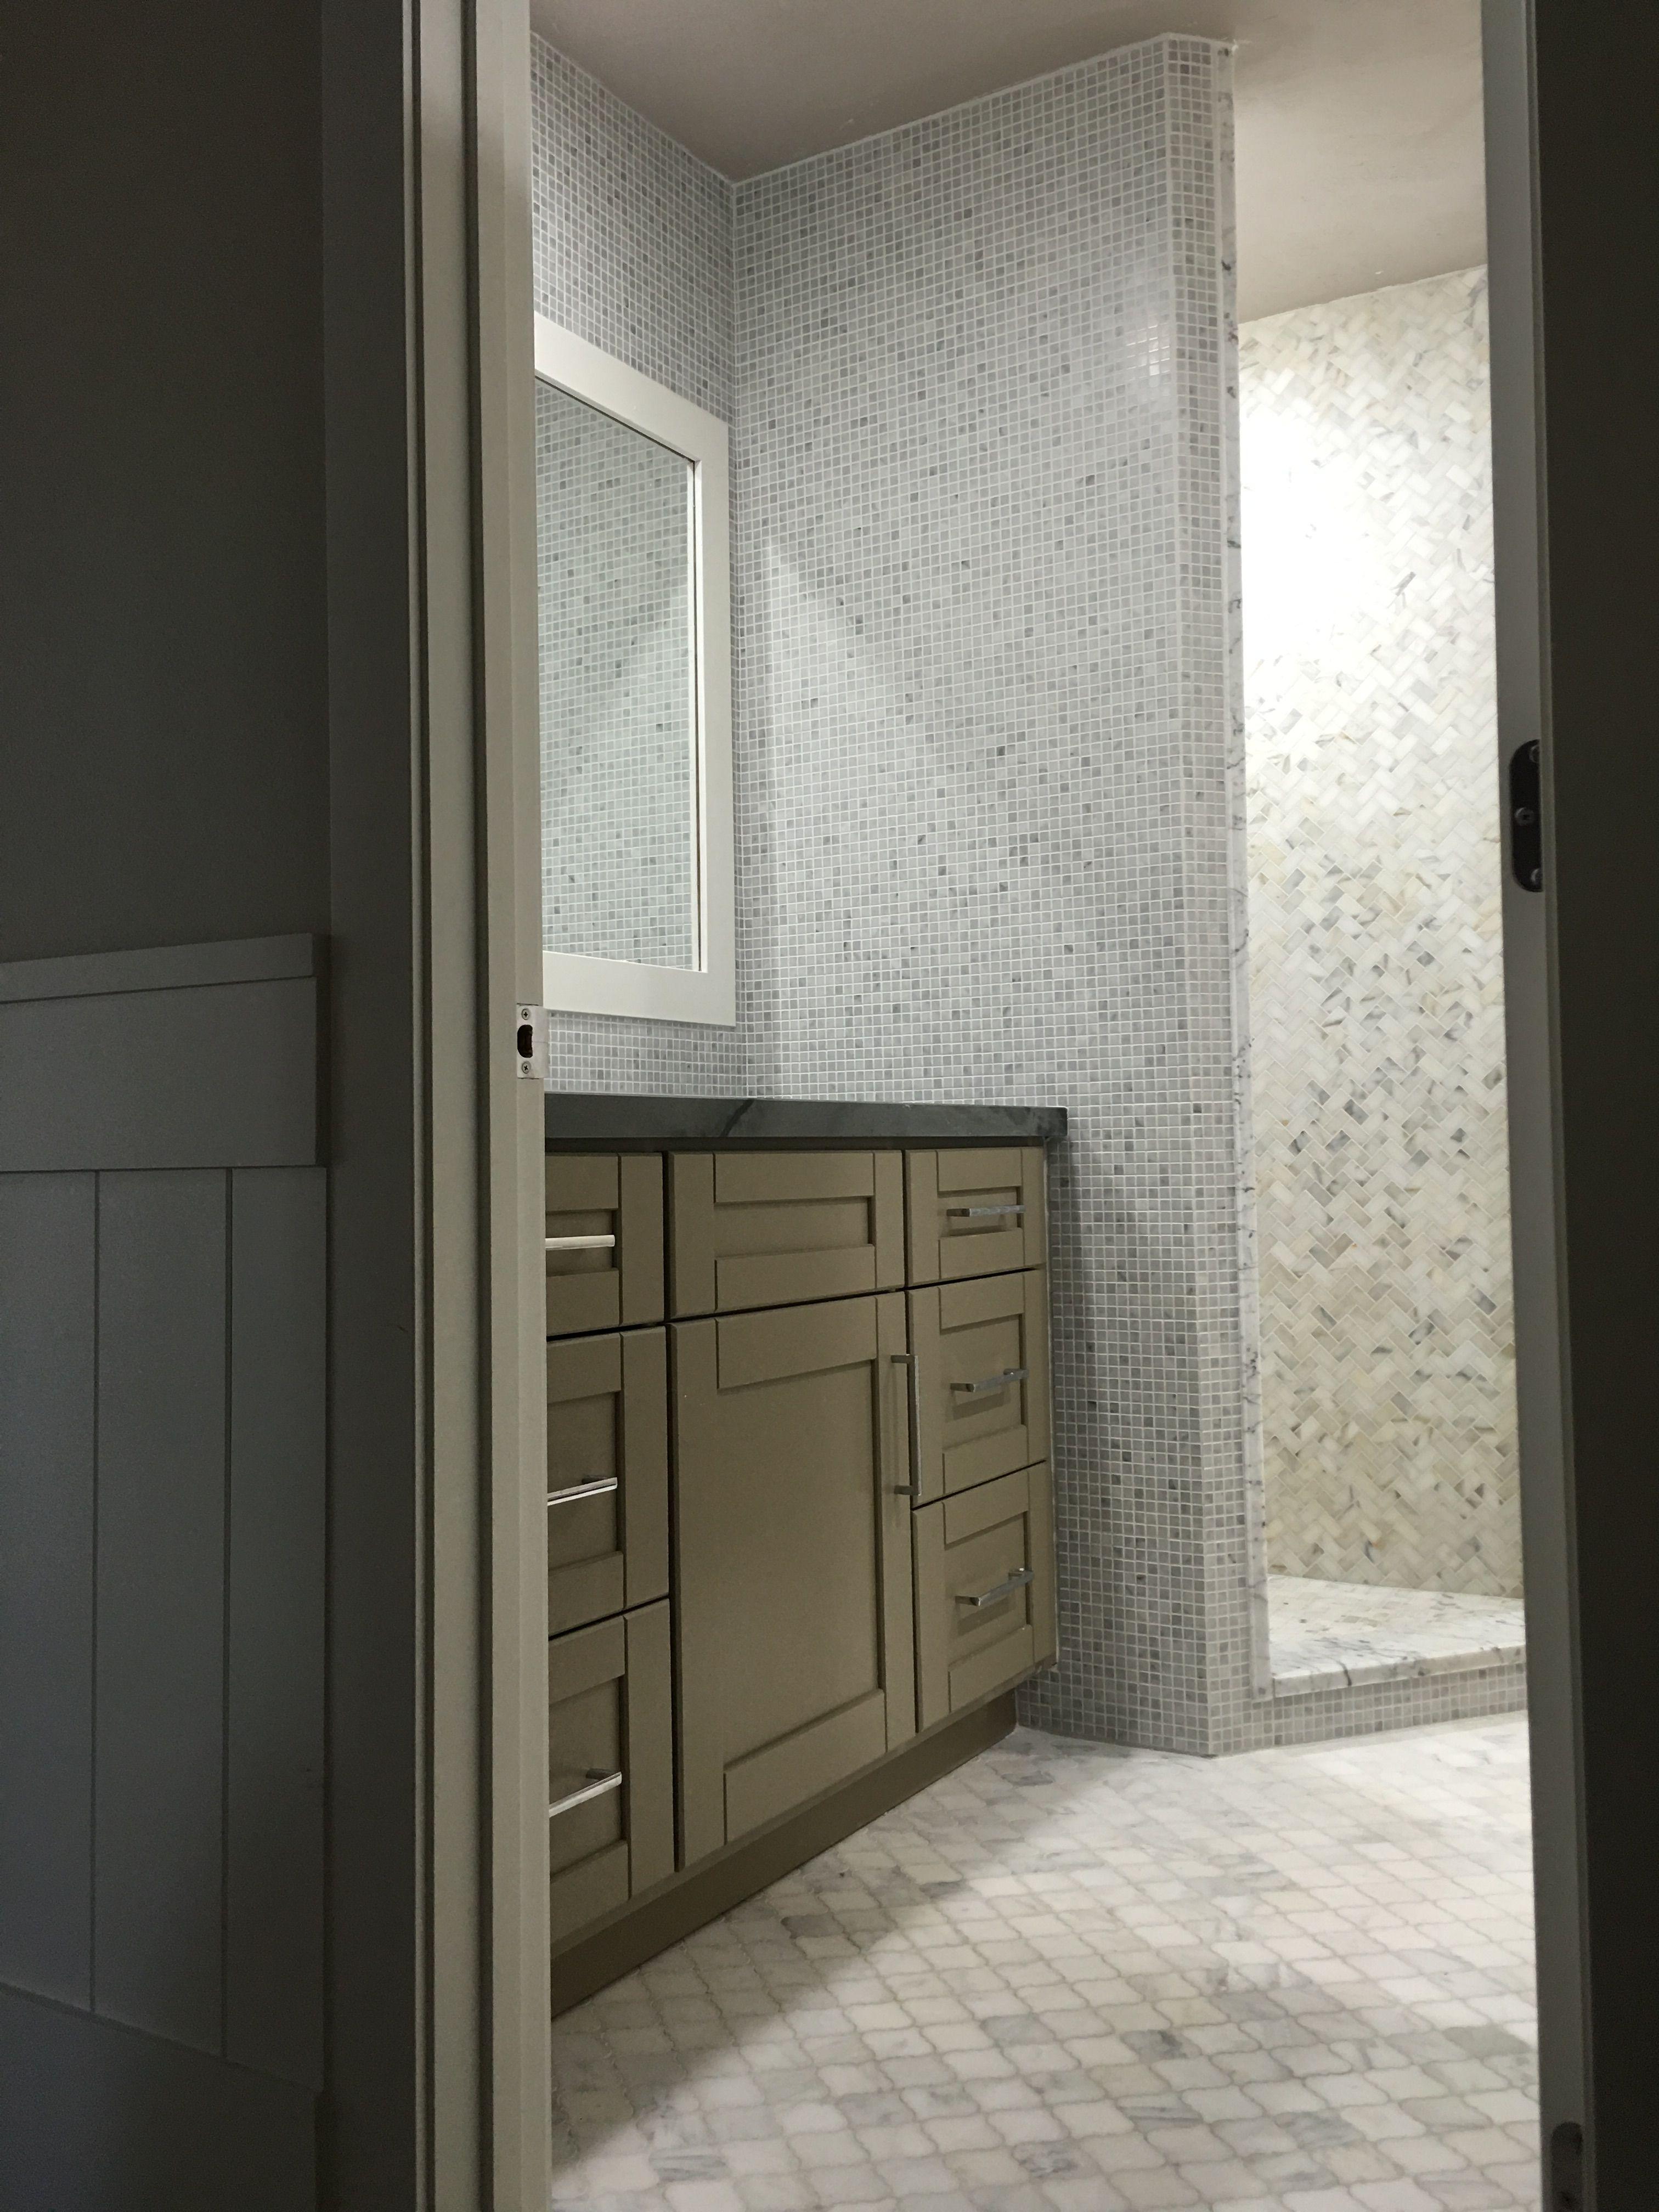 Backsplash accent wall: Honed Bianco Carrara Marble 5/8\